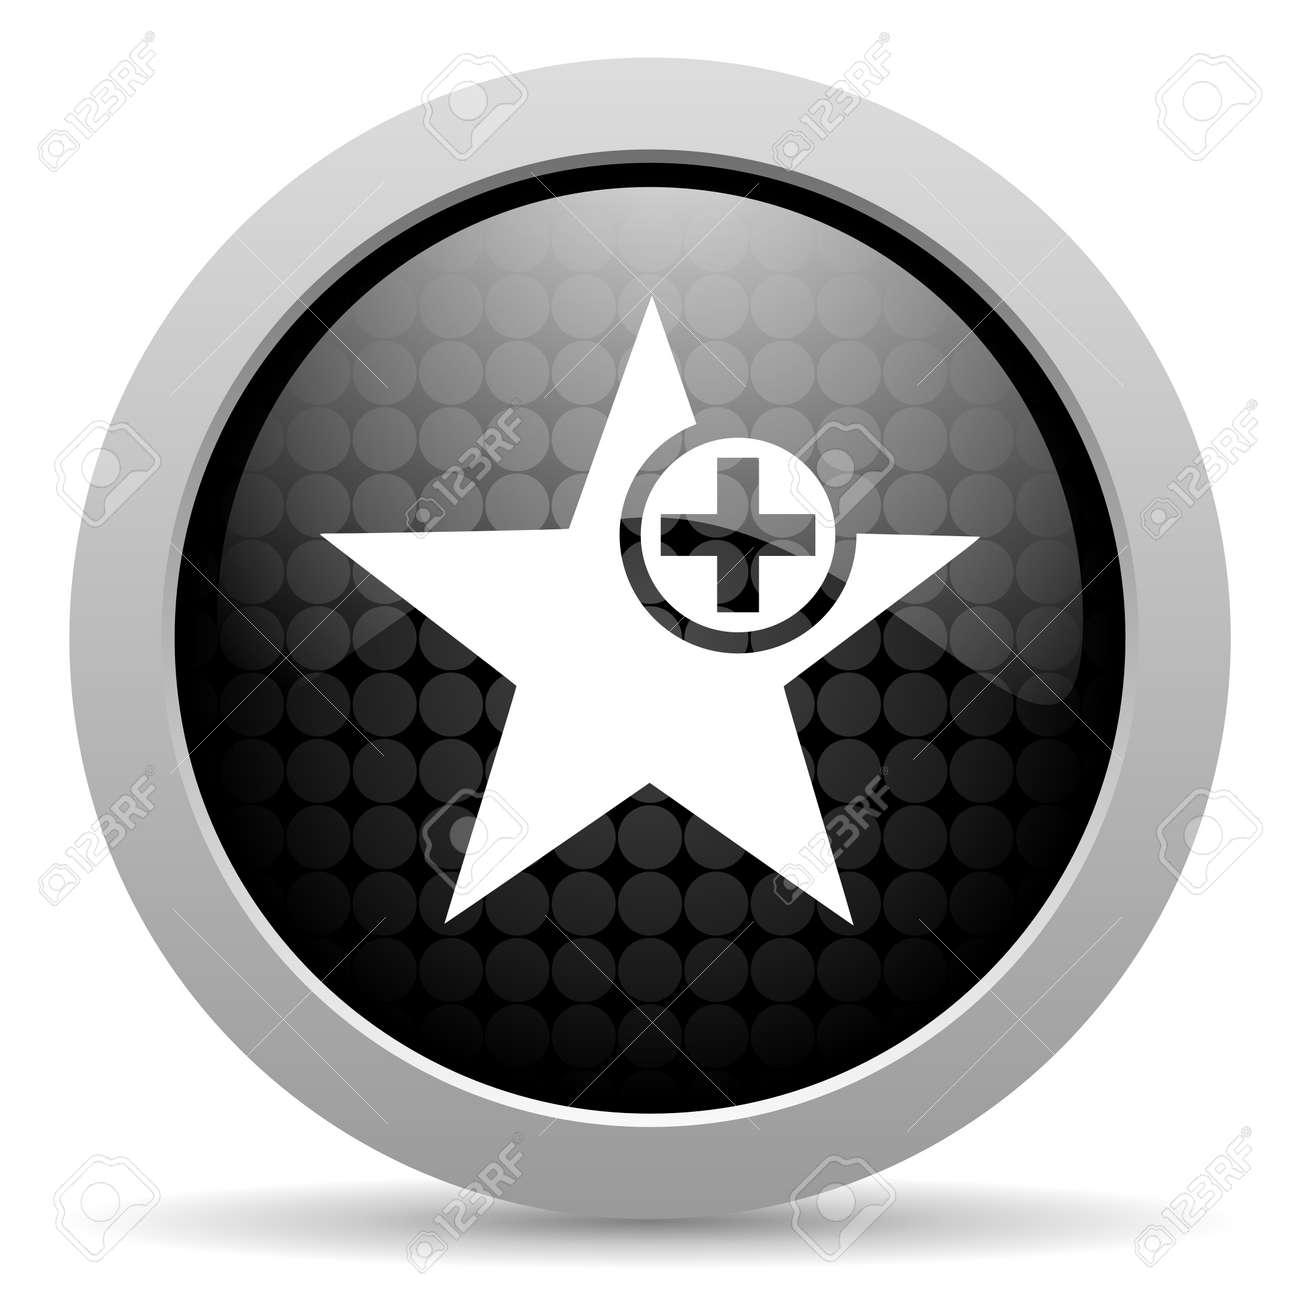 star black circle web glossy icon Stock Photo - 19347597